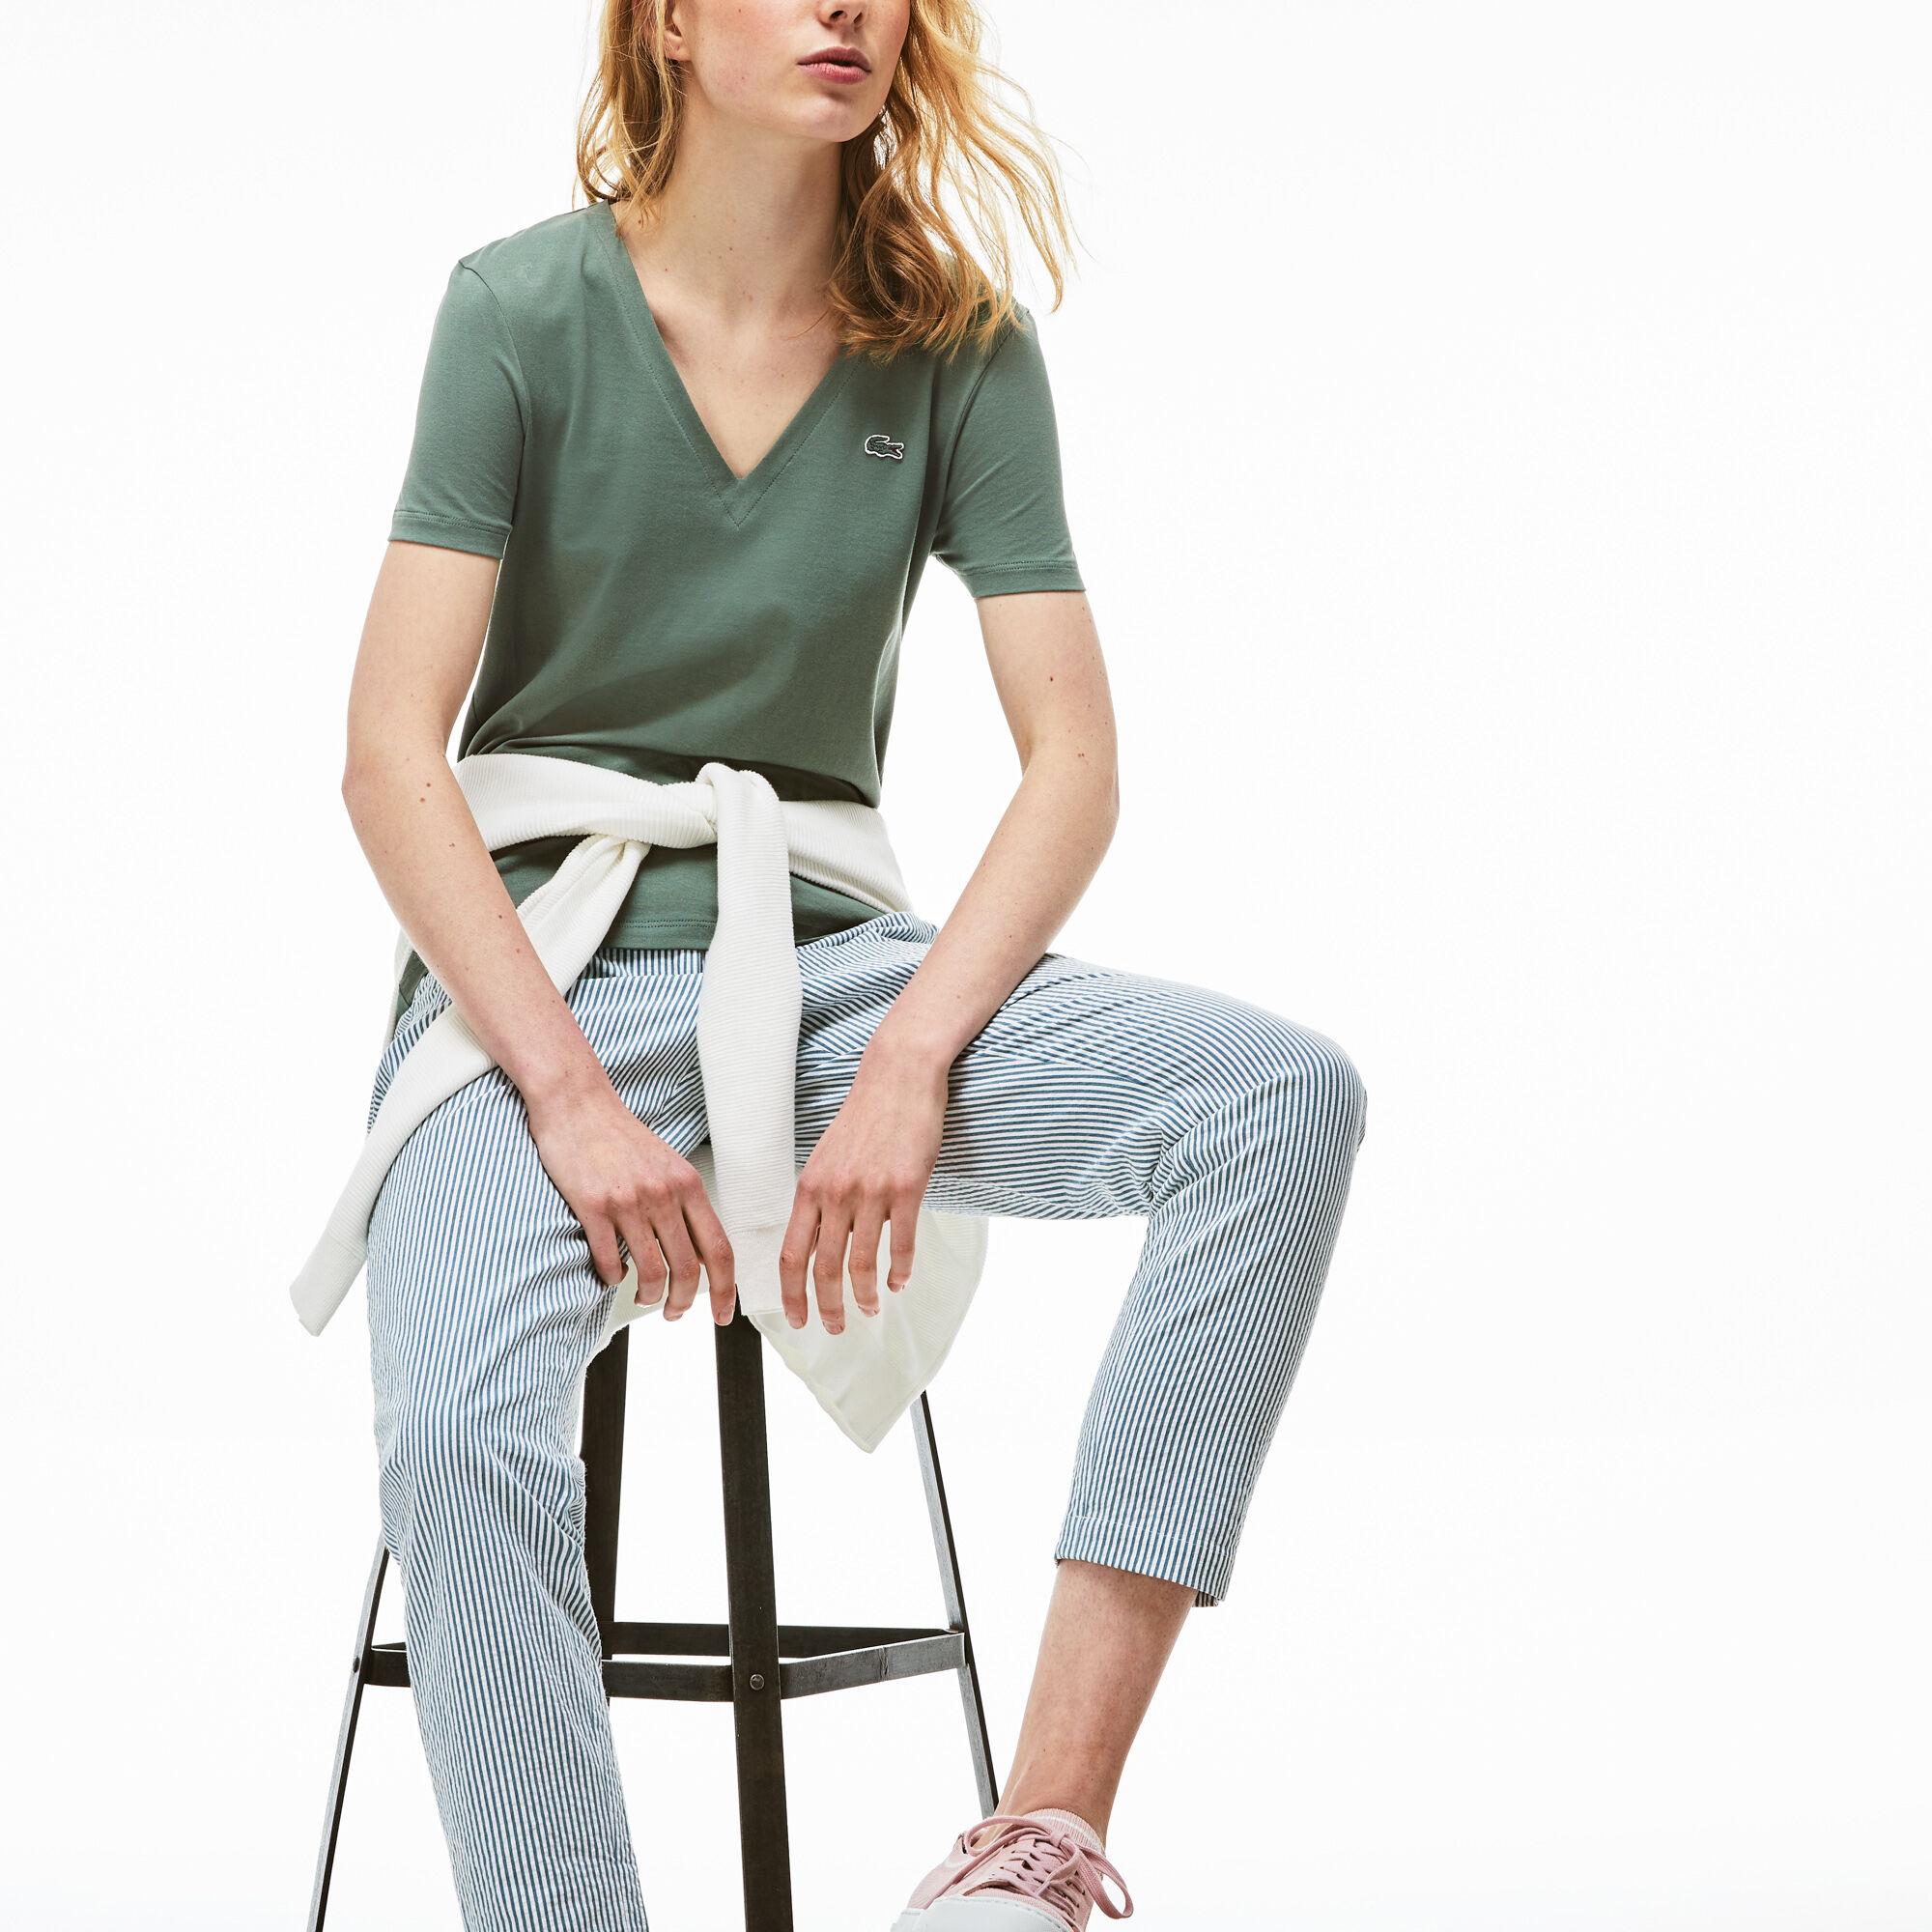 Women's Slim Fit V-Neck Cotton Jersey T-shirt